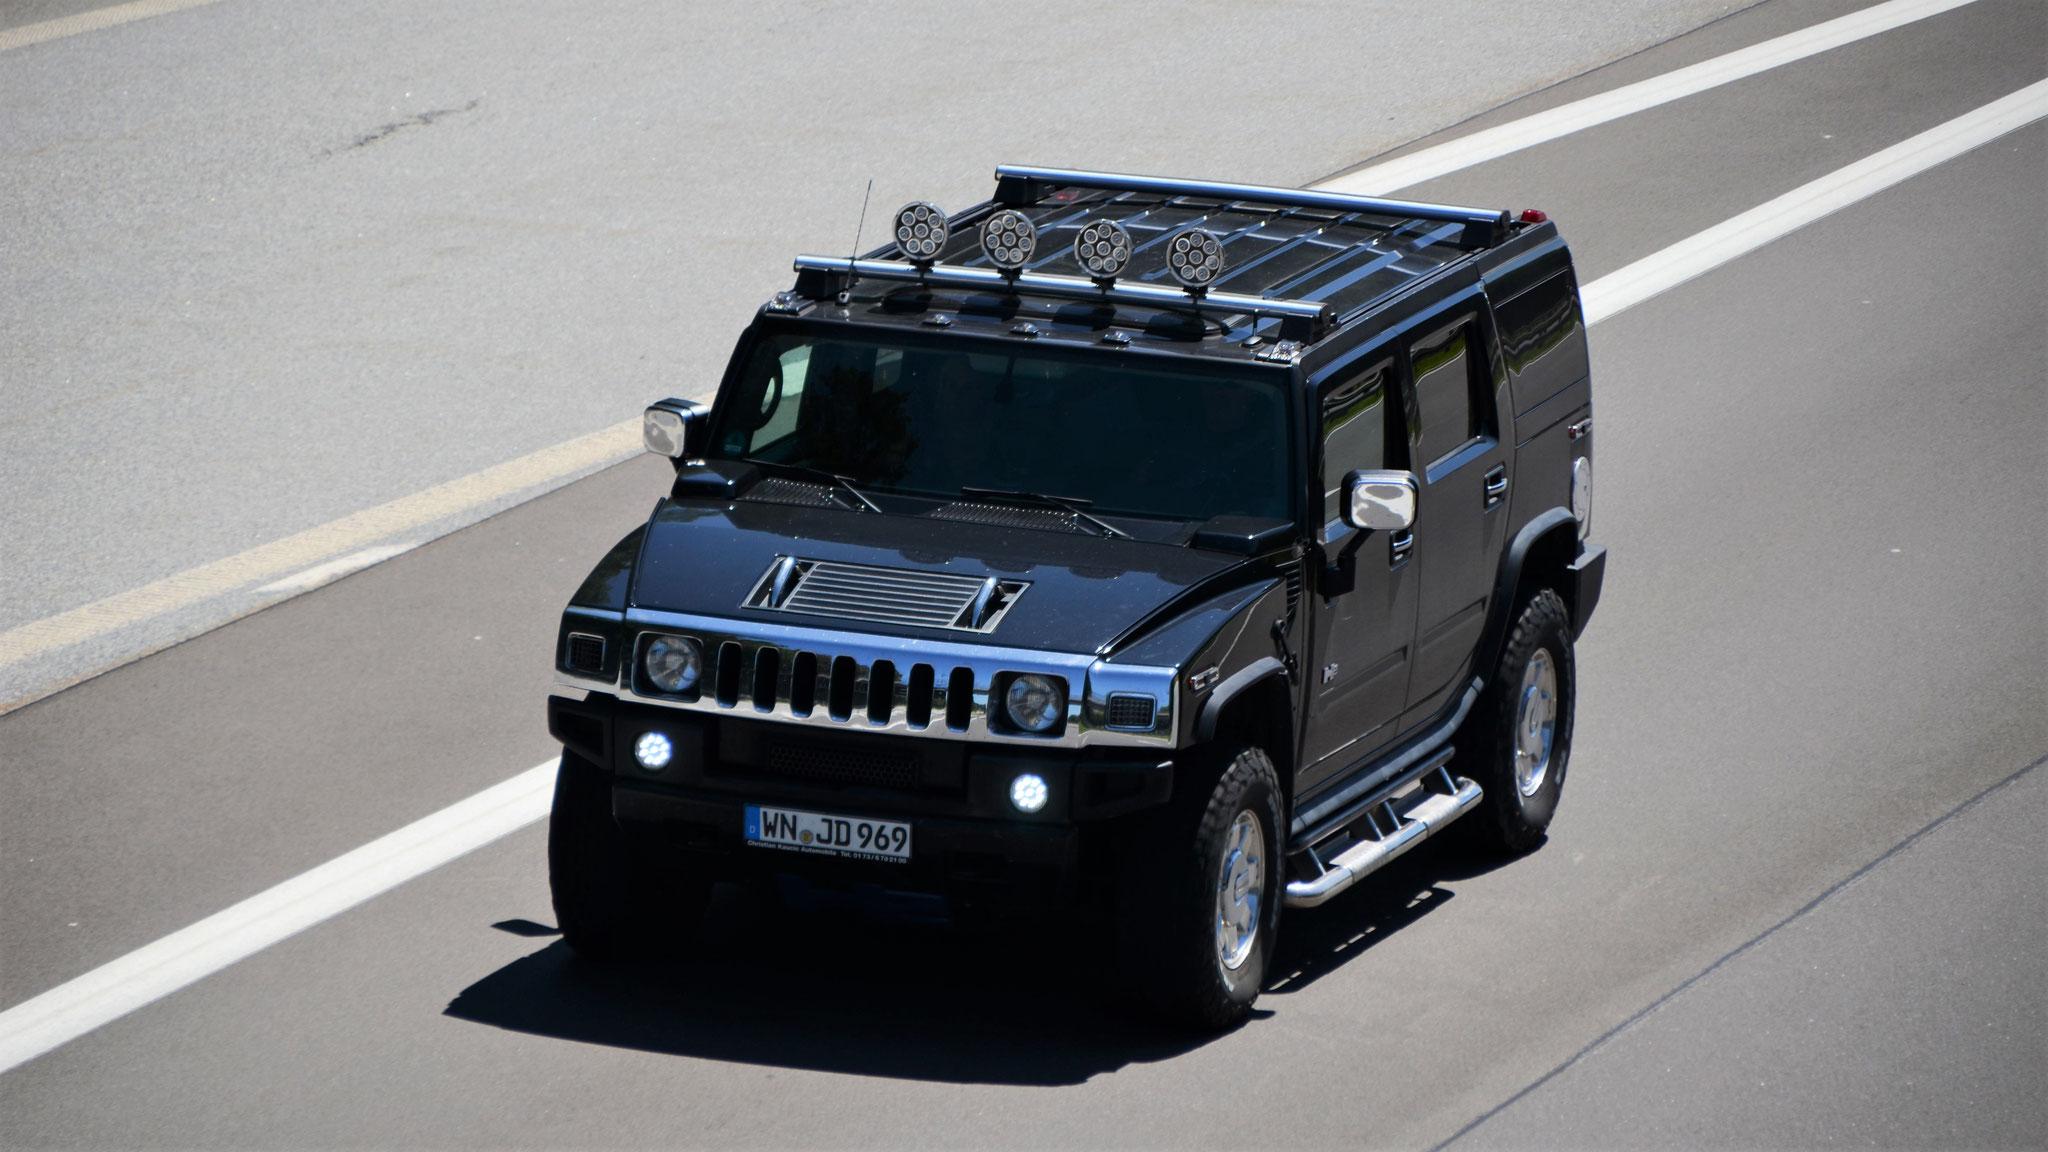 Hummer H2 - WN-JD-969